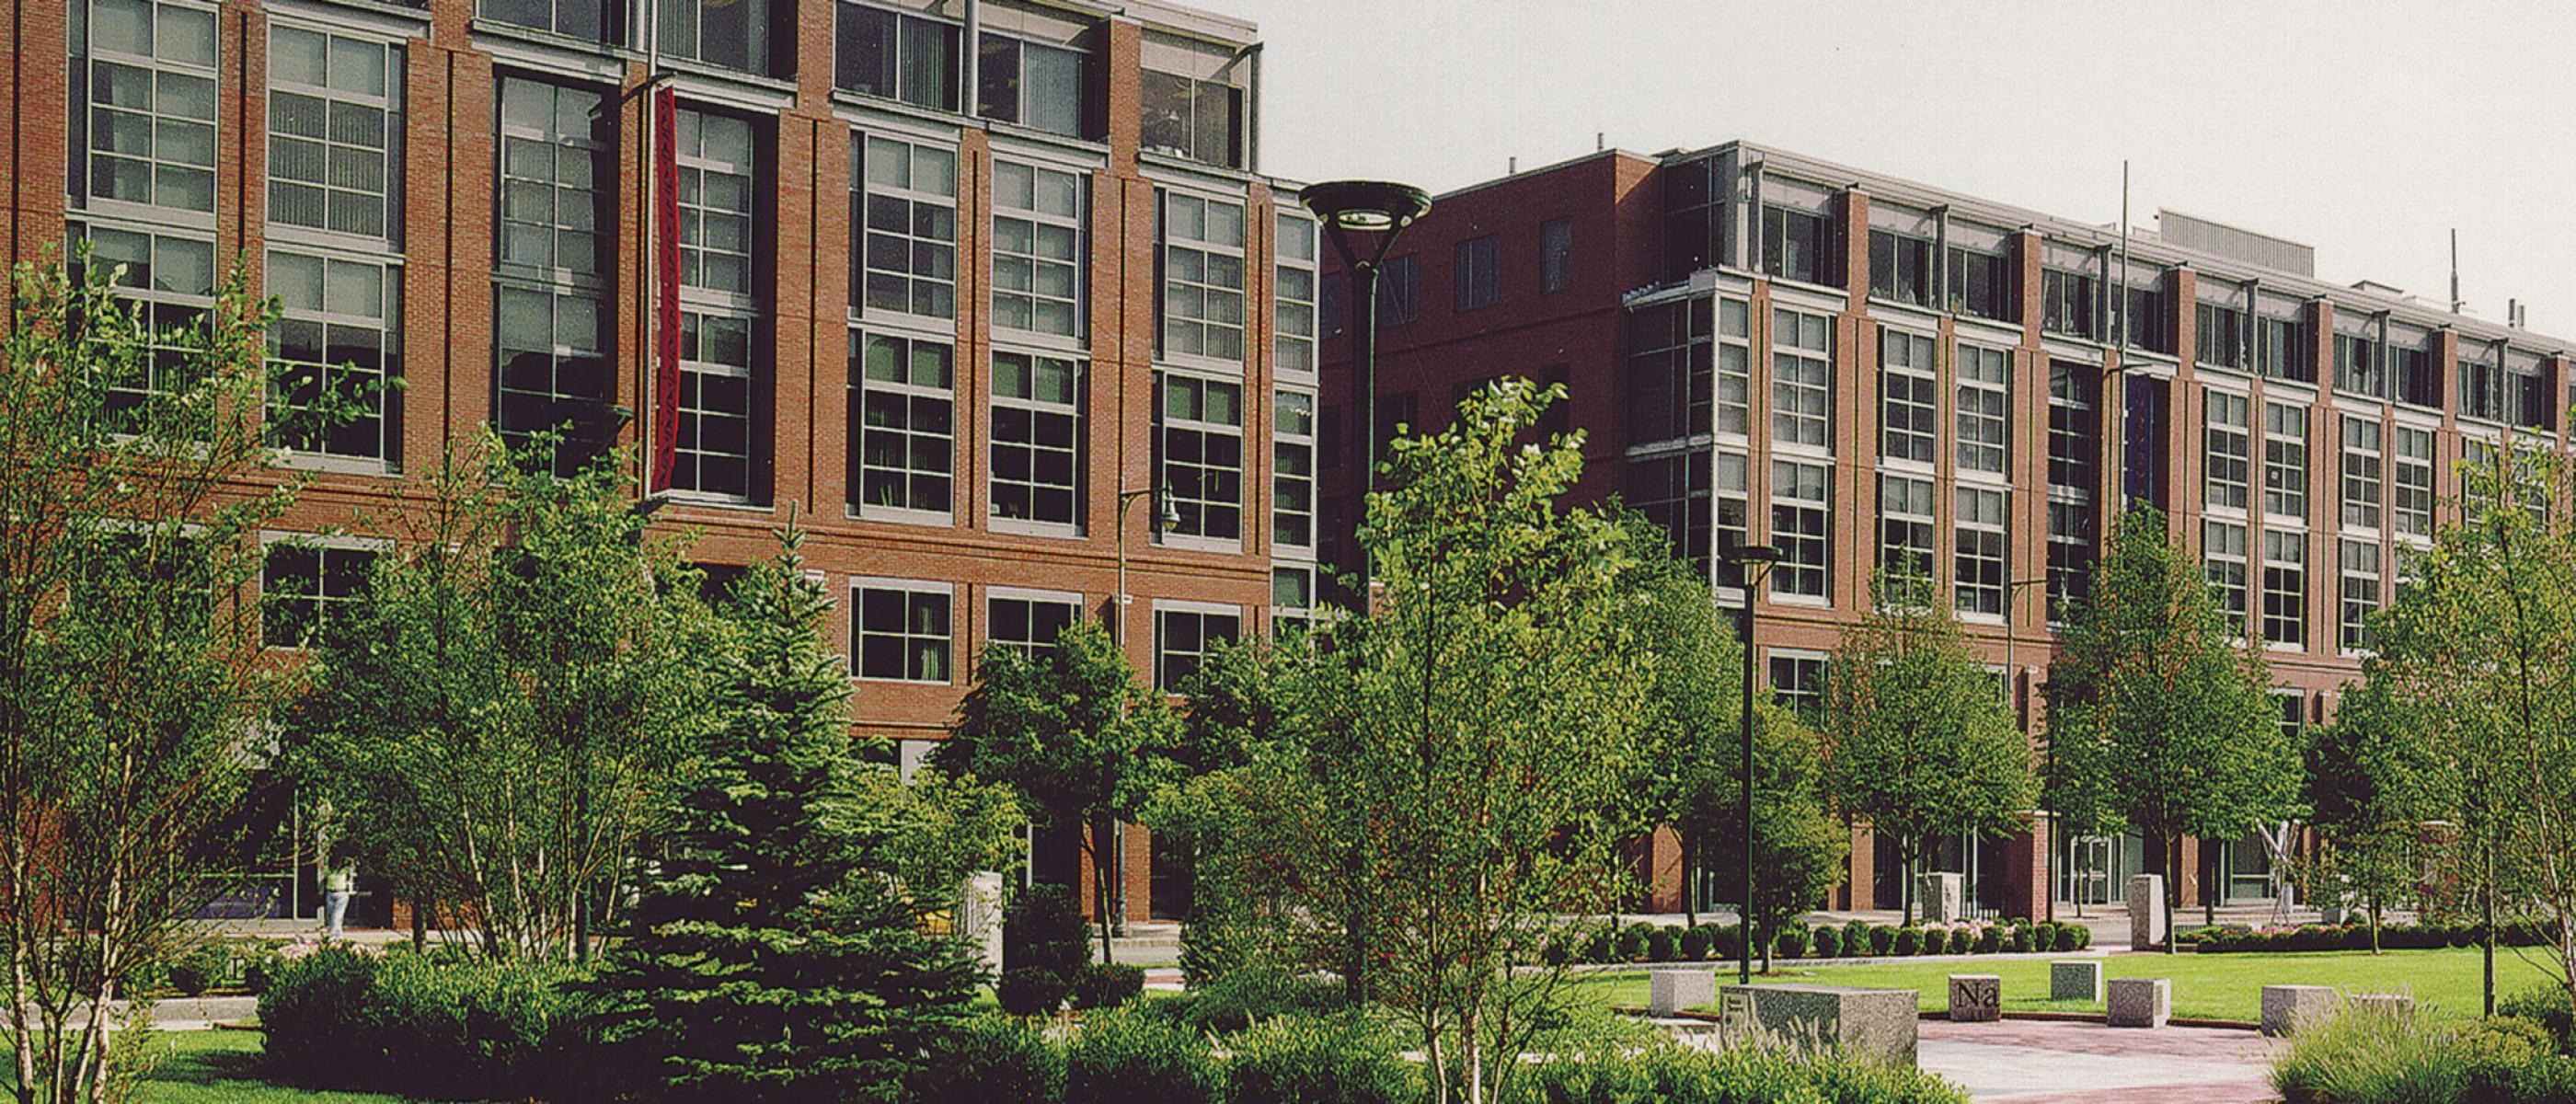 The Clark Building